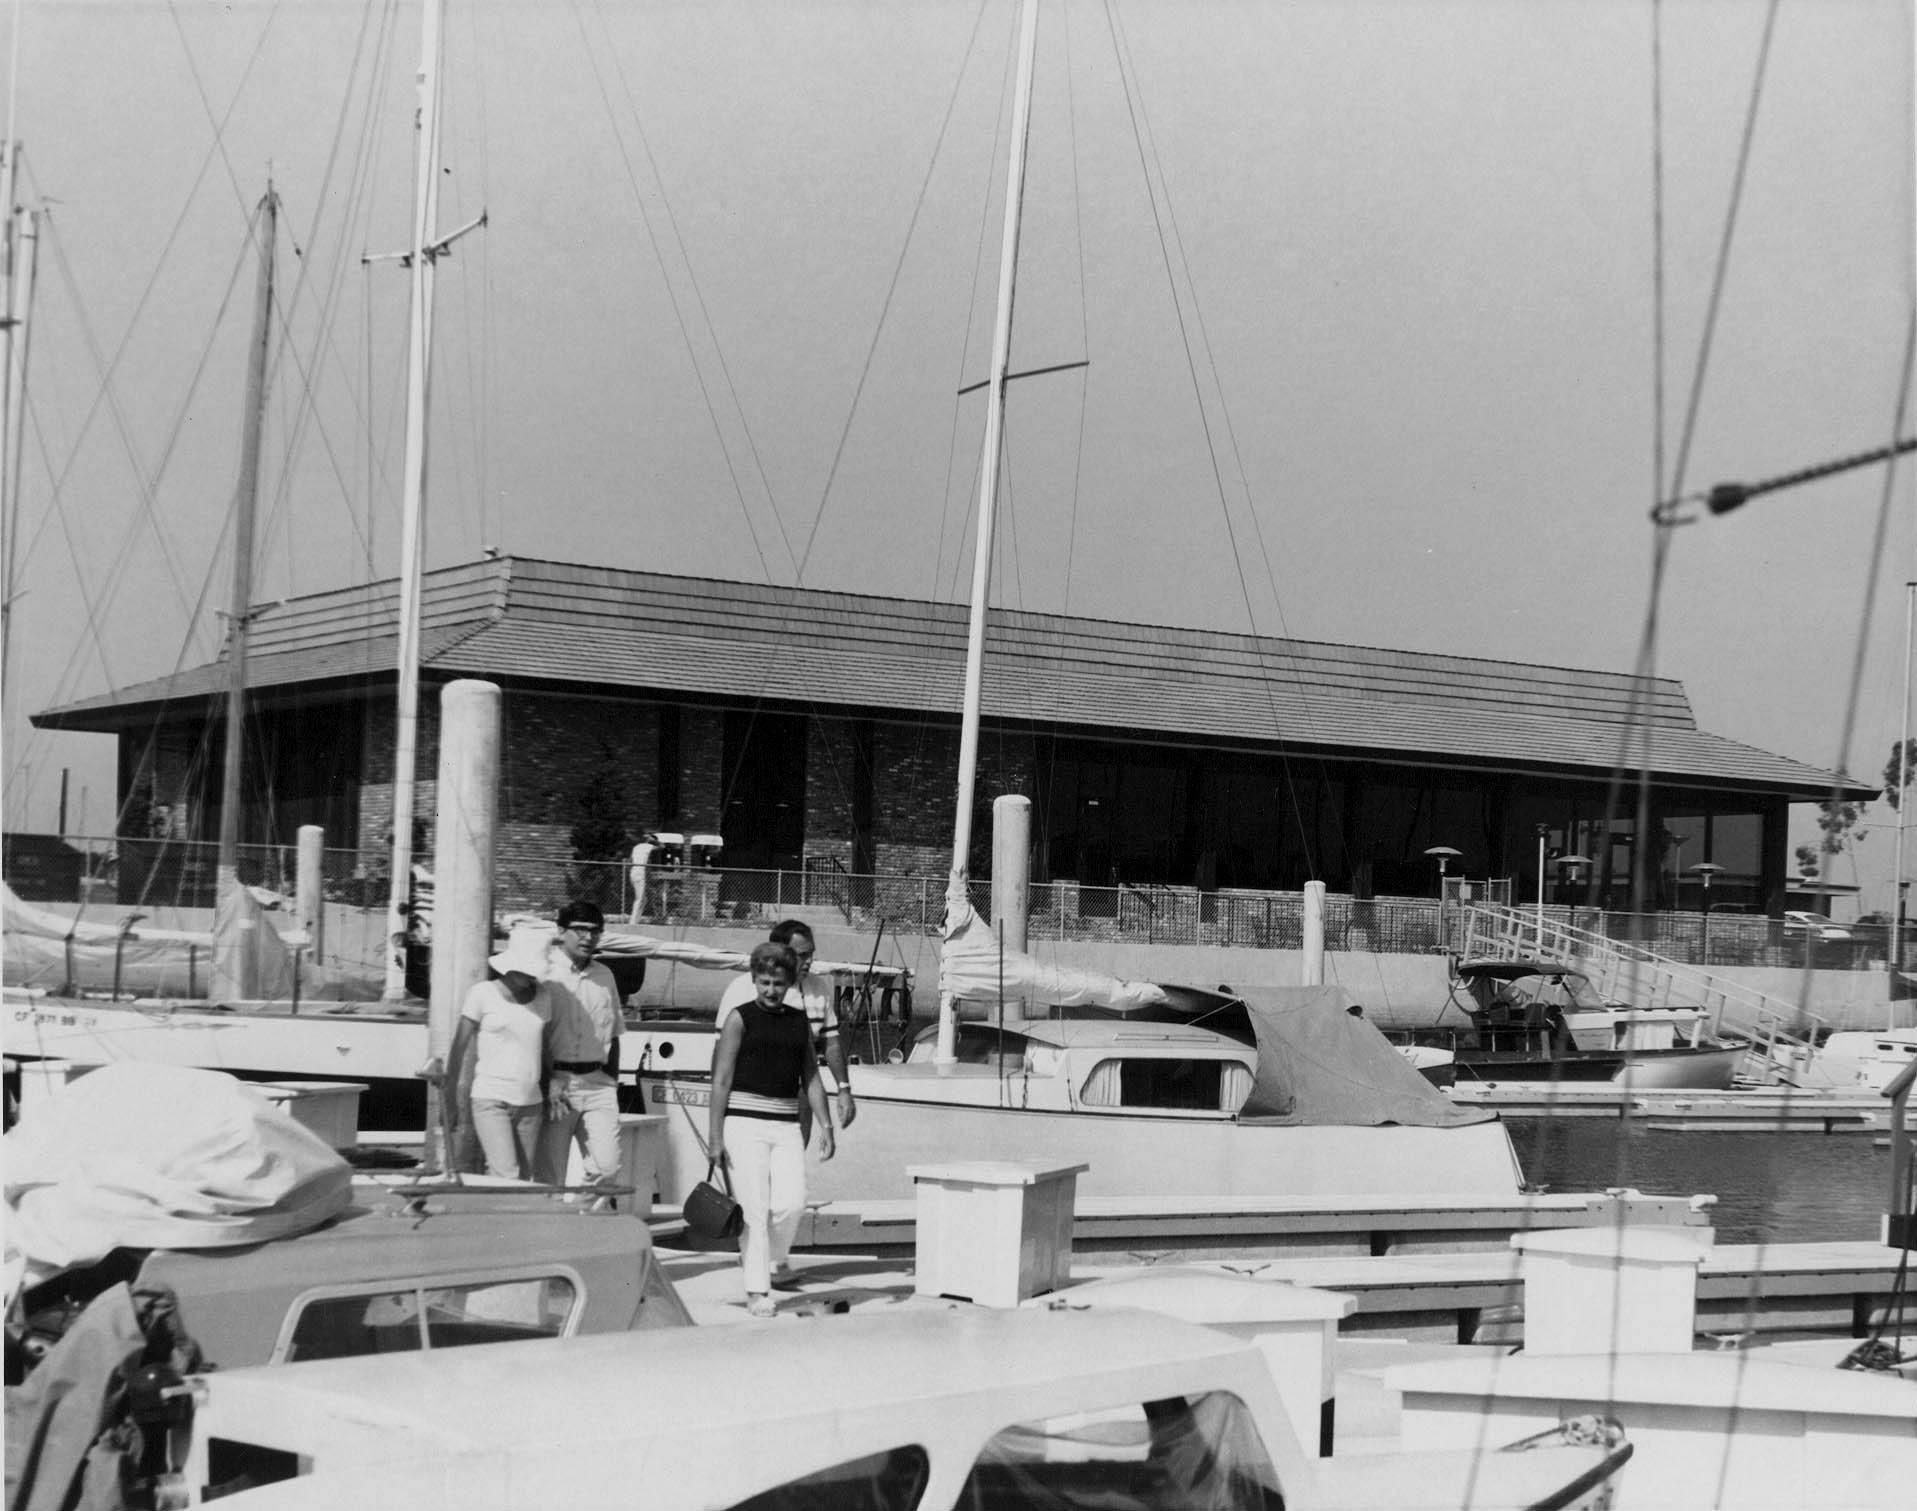 hm236bw-charthouse-resaurant-panay-wayc-basin-1967